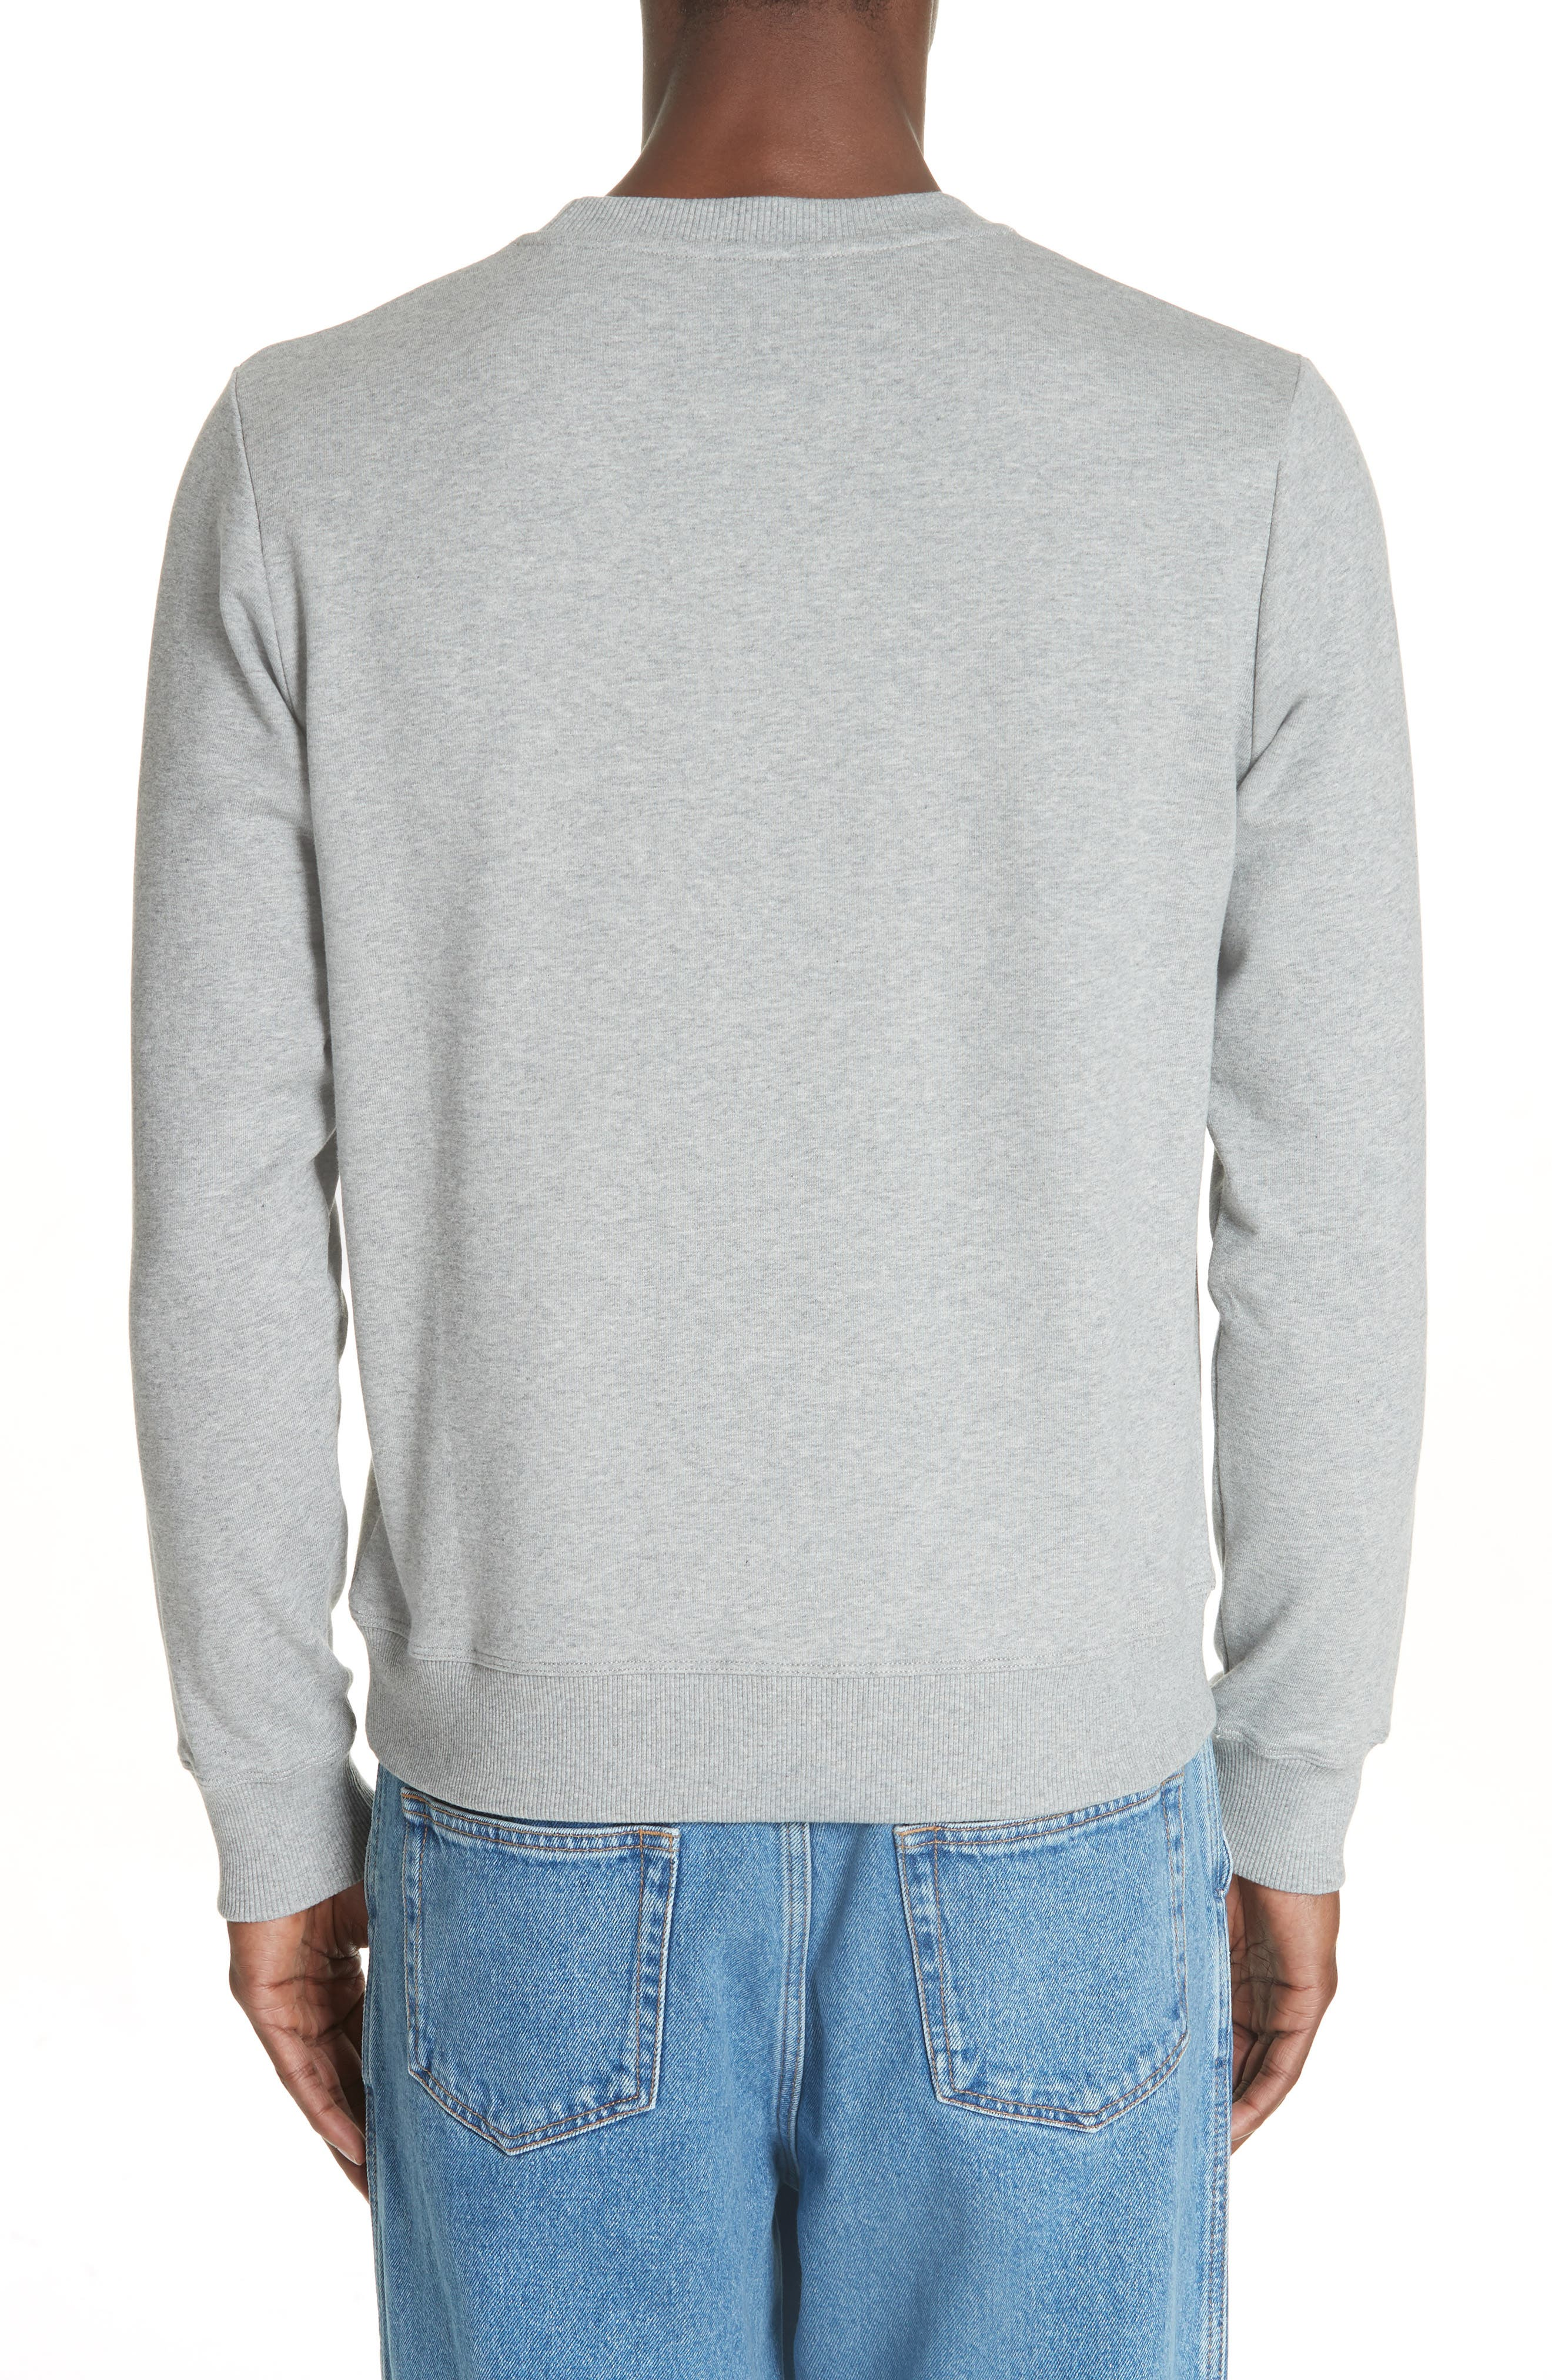 LOEWE, Embroidered Anagram Logo Sweatshirt, Alternate thumbnail 2, color, 1120 GREY